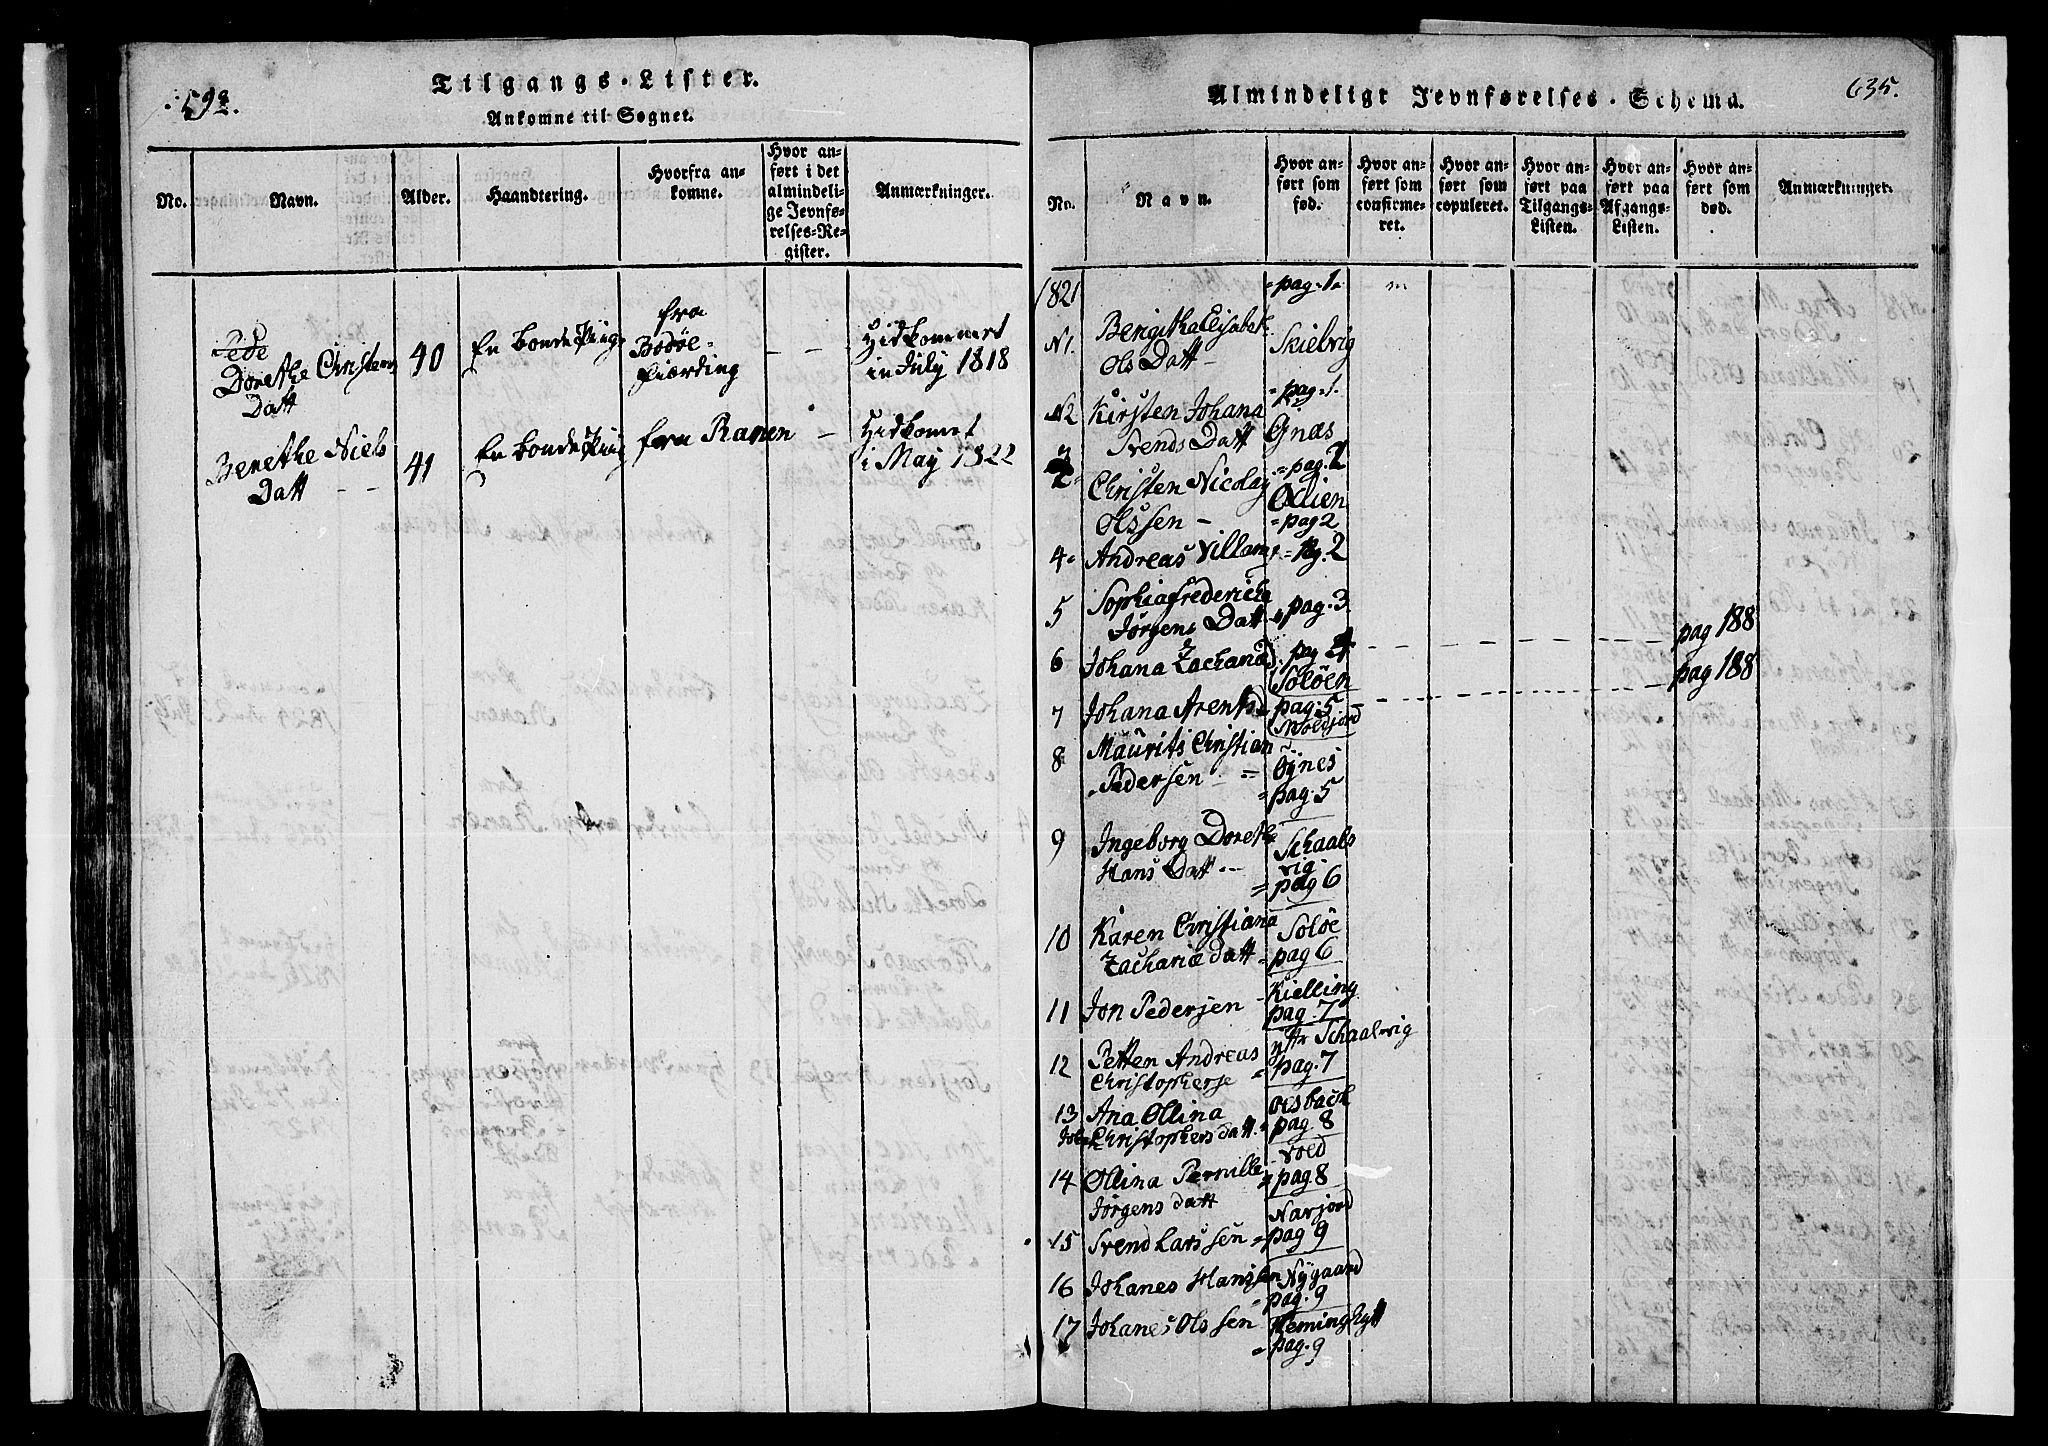 SAT, Ministerialprotokoller, klokkerbøker og fødselsregistre - Nordland, 846/L0651: Klokkerbok nr. 846C01, 1821-1841, s. 598-599